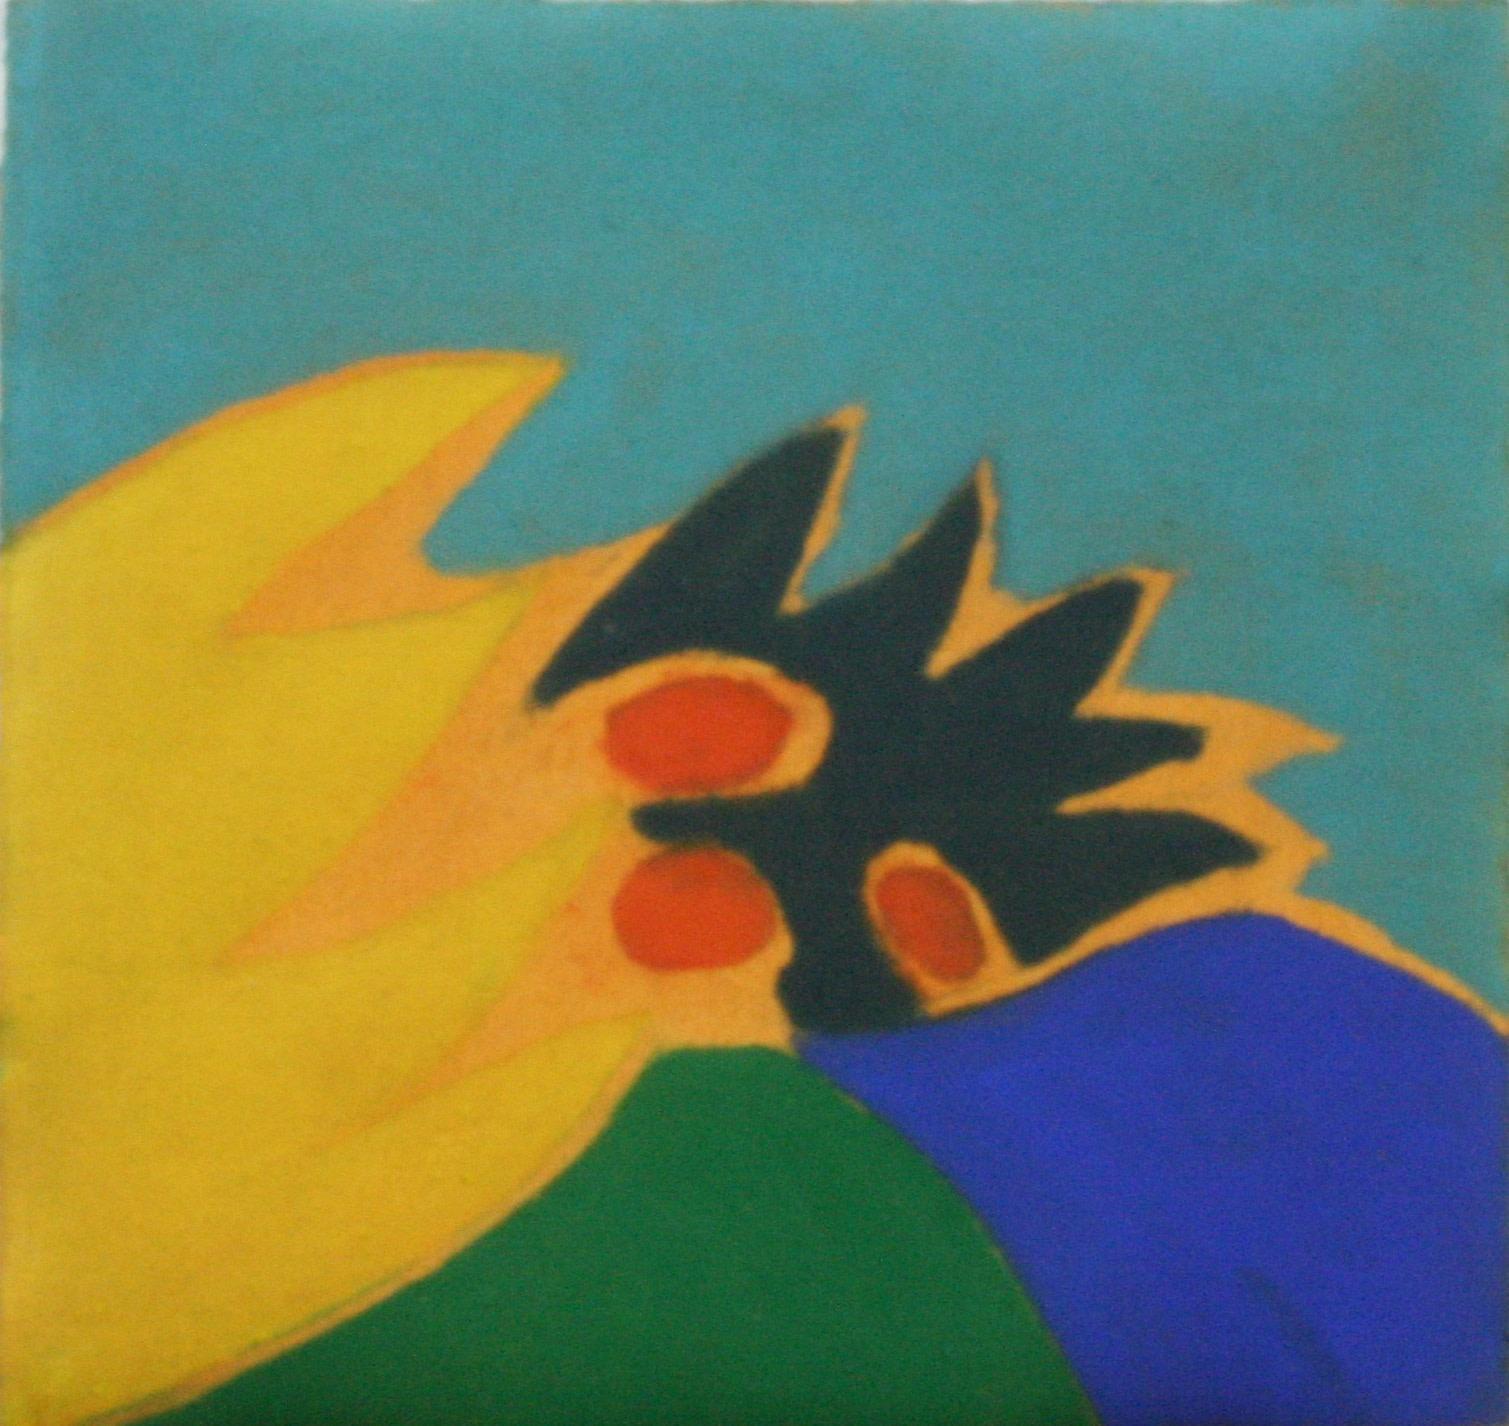 "<span class=""link fancybox-details-link""><a href=""/exhibitions/23/works/artworks_standalone10827/"">View Detail Page</a></span><div class=""artist""><span class=""artist""><strong>Ursula Leach RE</strong></span></div><div class=""title""><em>Exotic Plant II</em></div><div class=""medium"">carborundum & hand colouring<br></div><div class=""dimensions"">30 x 30 cm</div><div class=""edition_details"">edition of 7</div>"